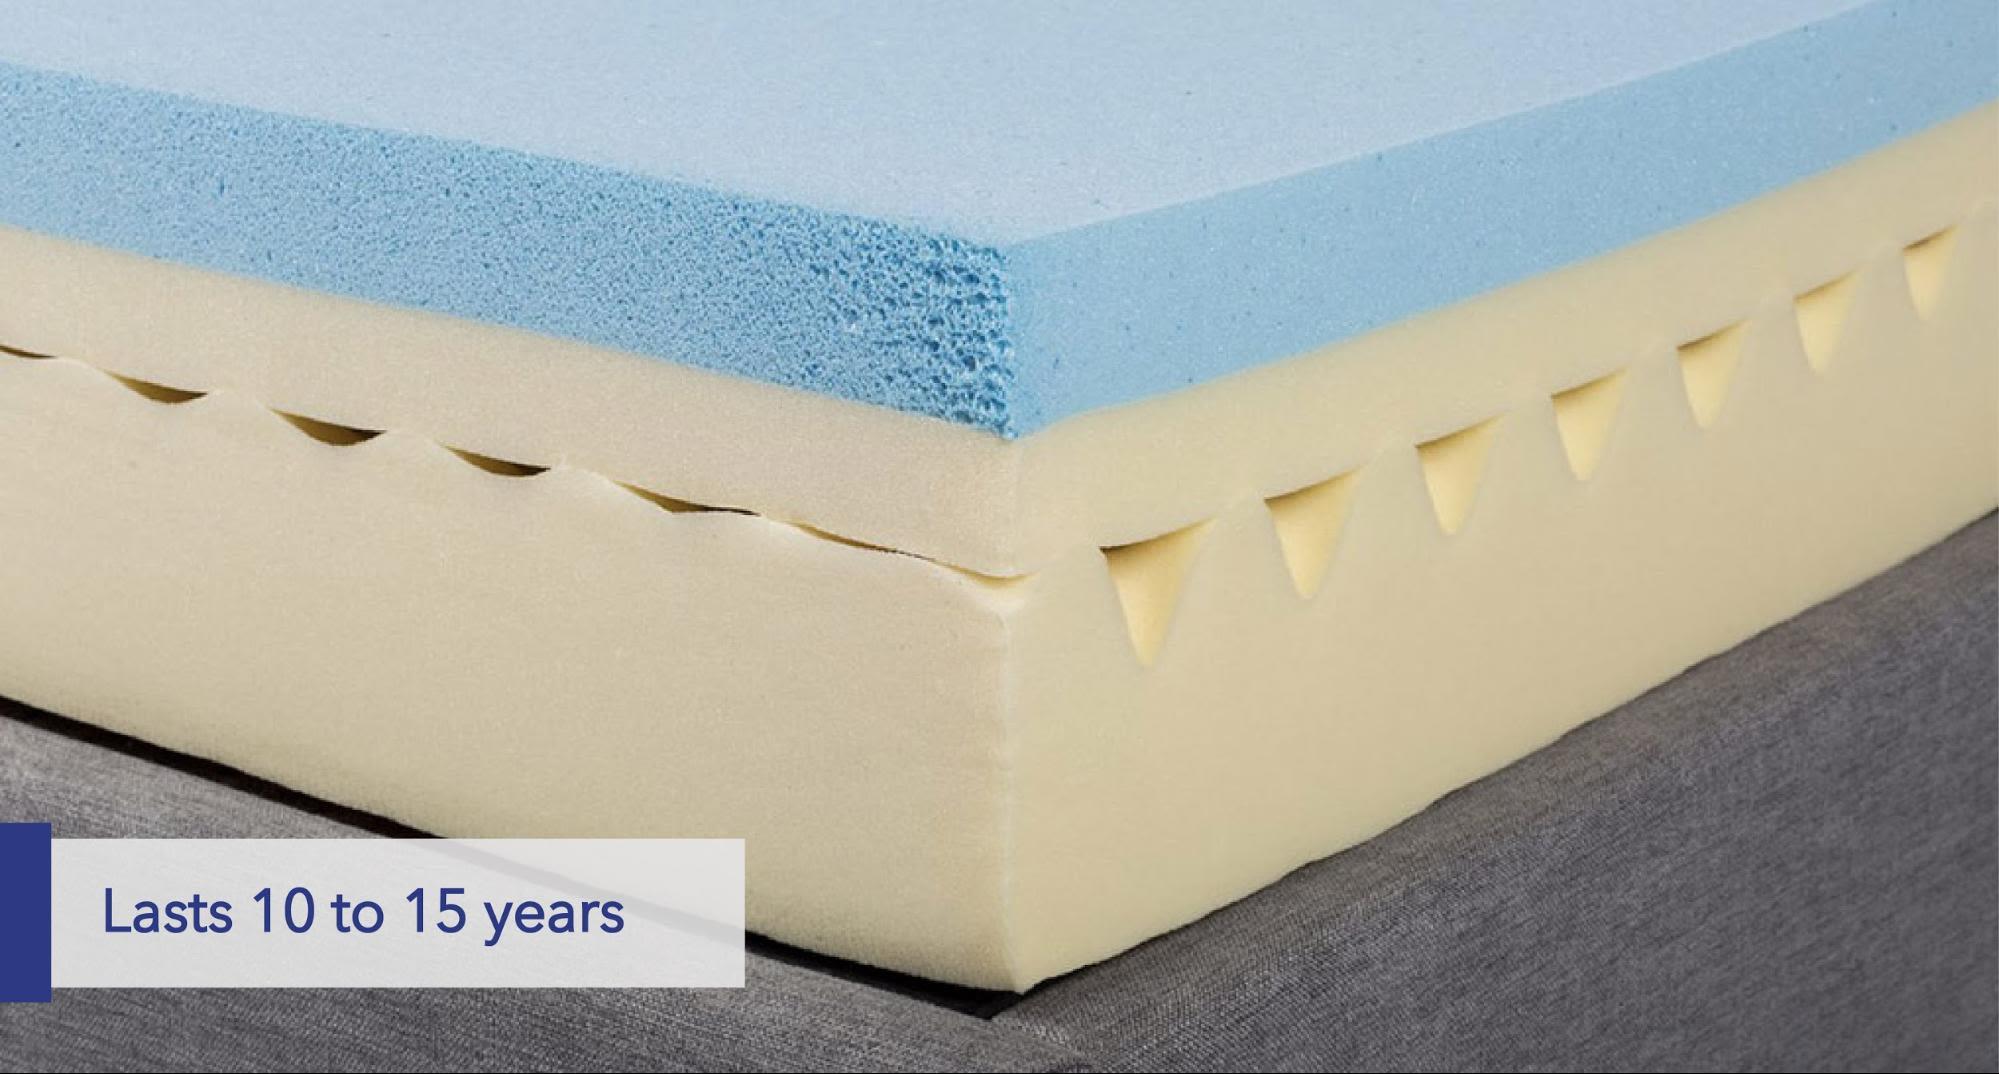 Memory foam lasts 10 to 15 years